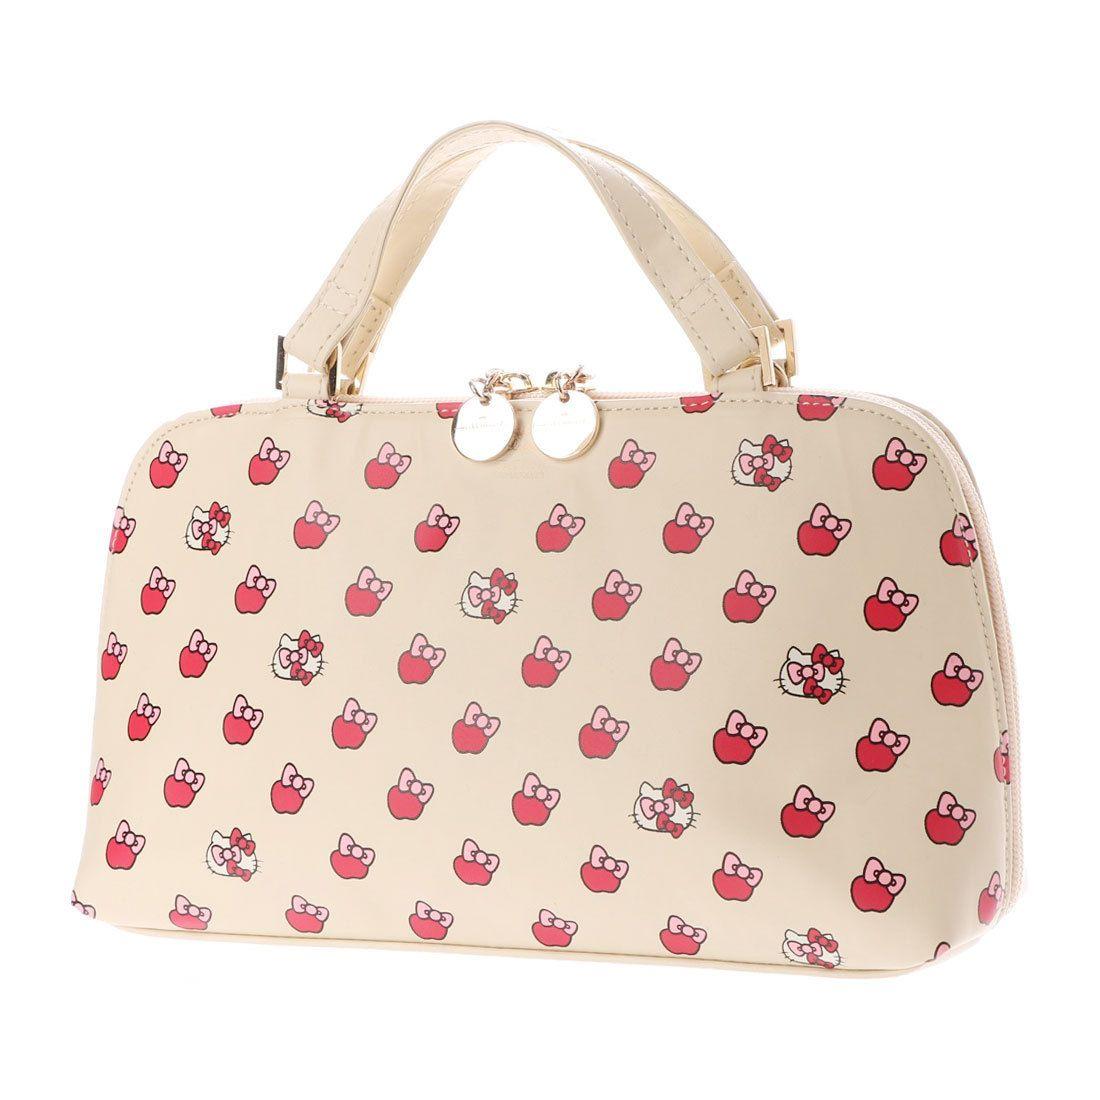 79d75f70c660 Hello Kitty × Hallmark 2Way Mini Shoulder Bag White  hellokitty   minishoulderbag  bag